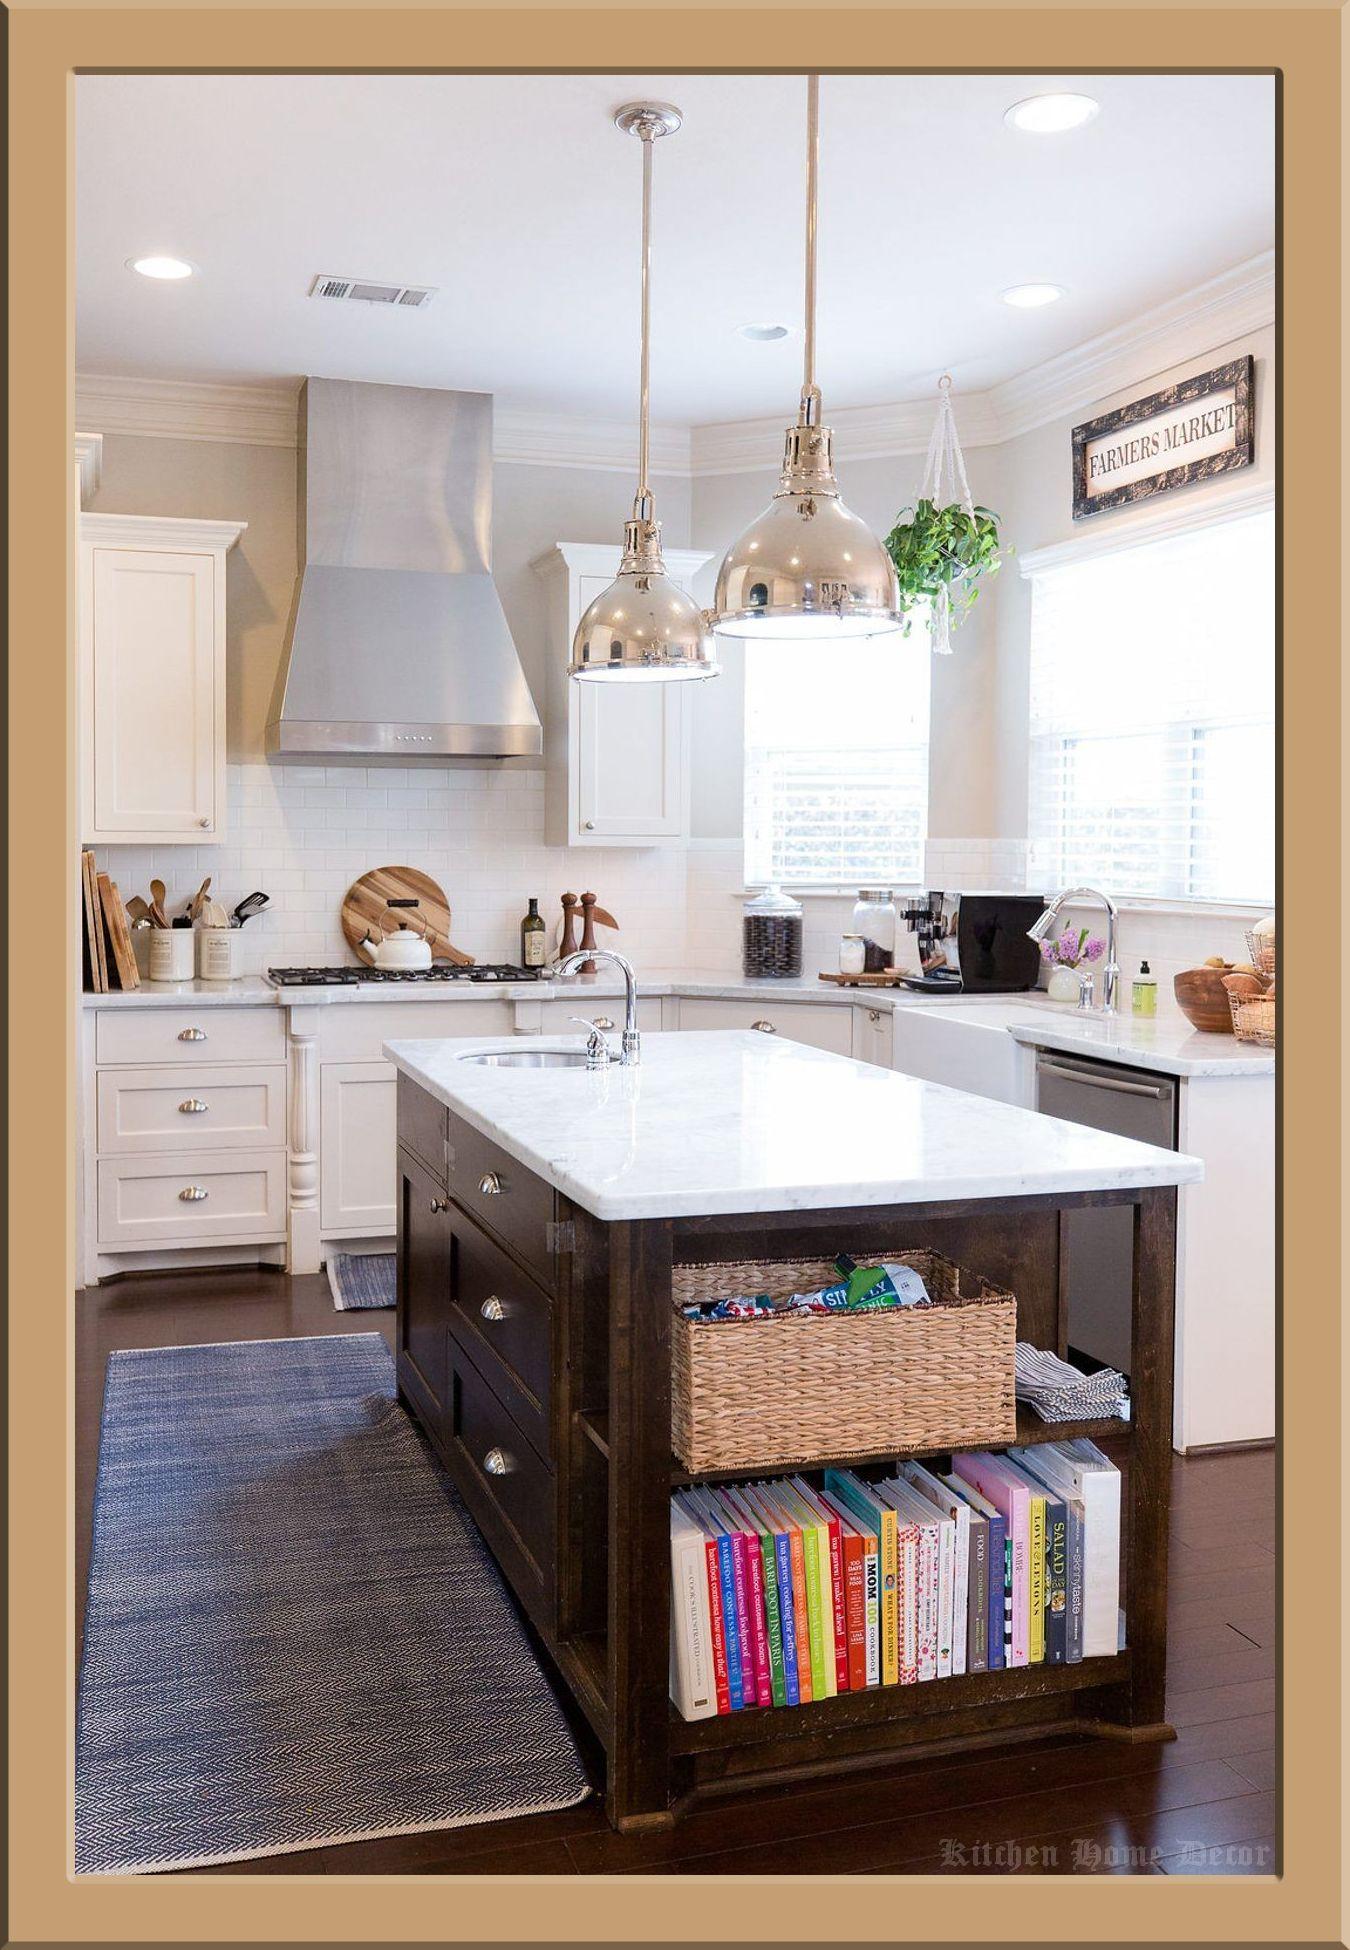 How To Make Money From The Kitchen Decor Phenomenon